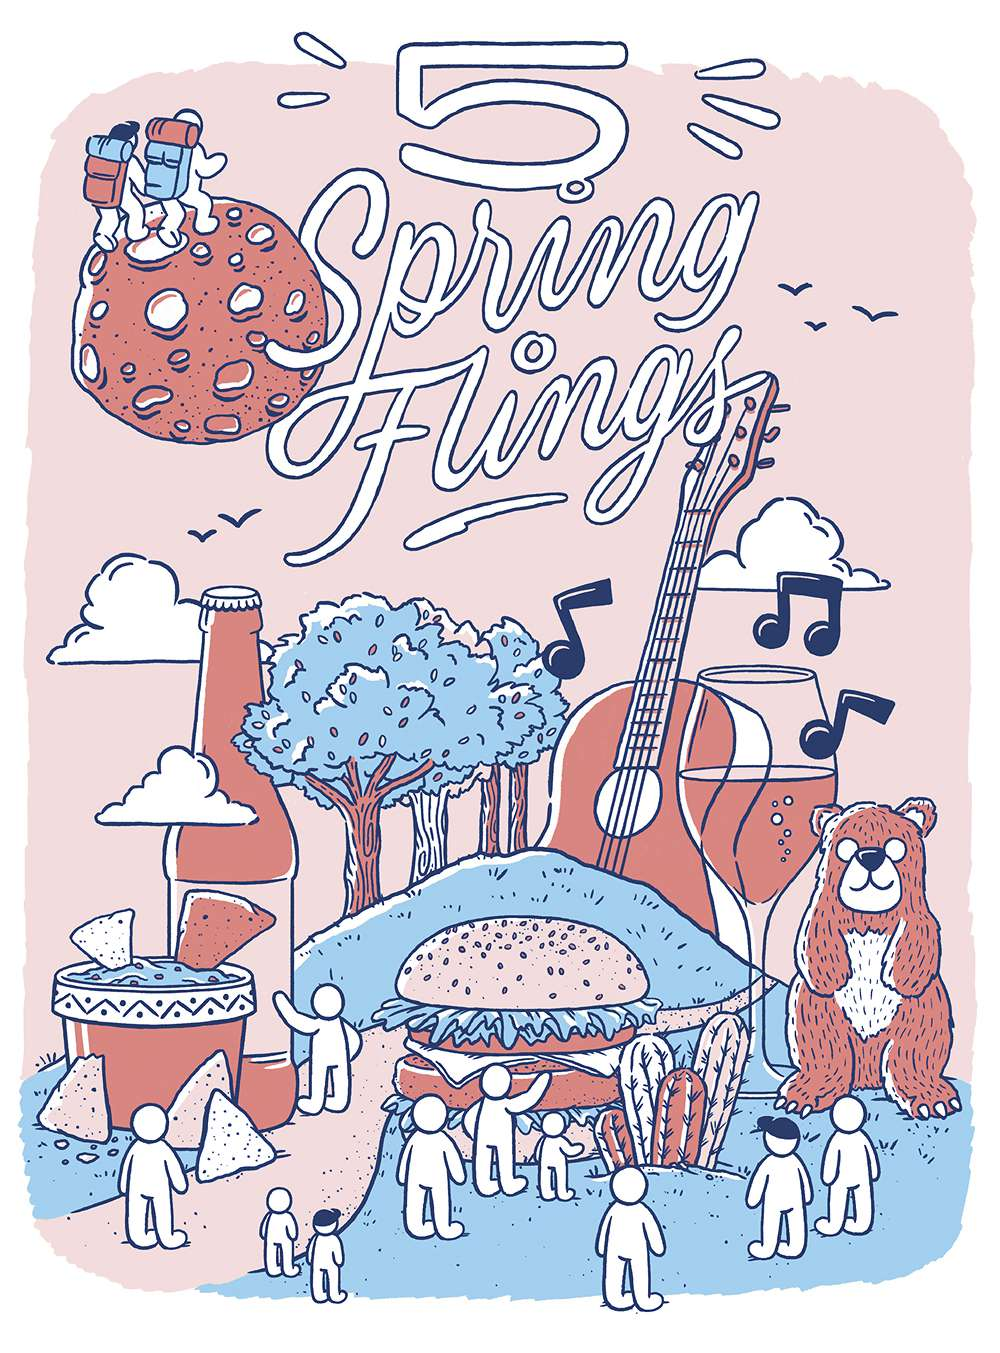 5 Spring Flings; Illustration & Handlettering by Scott Biersack